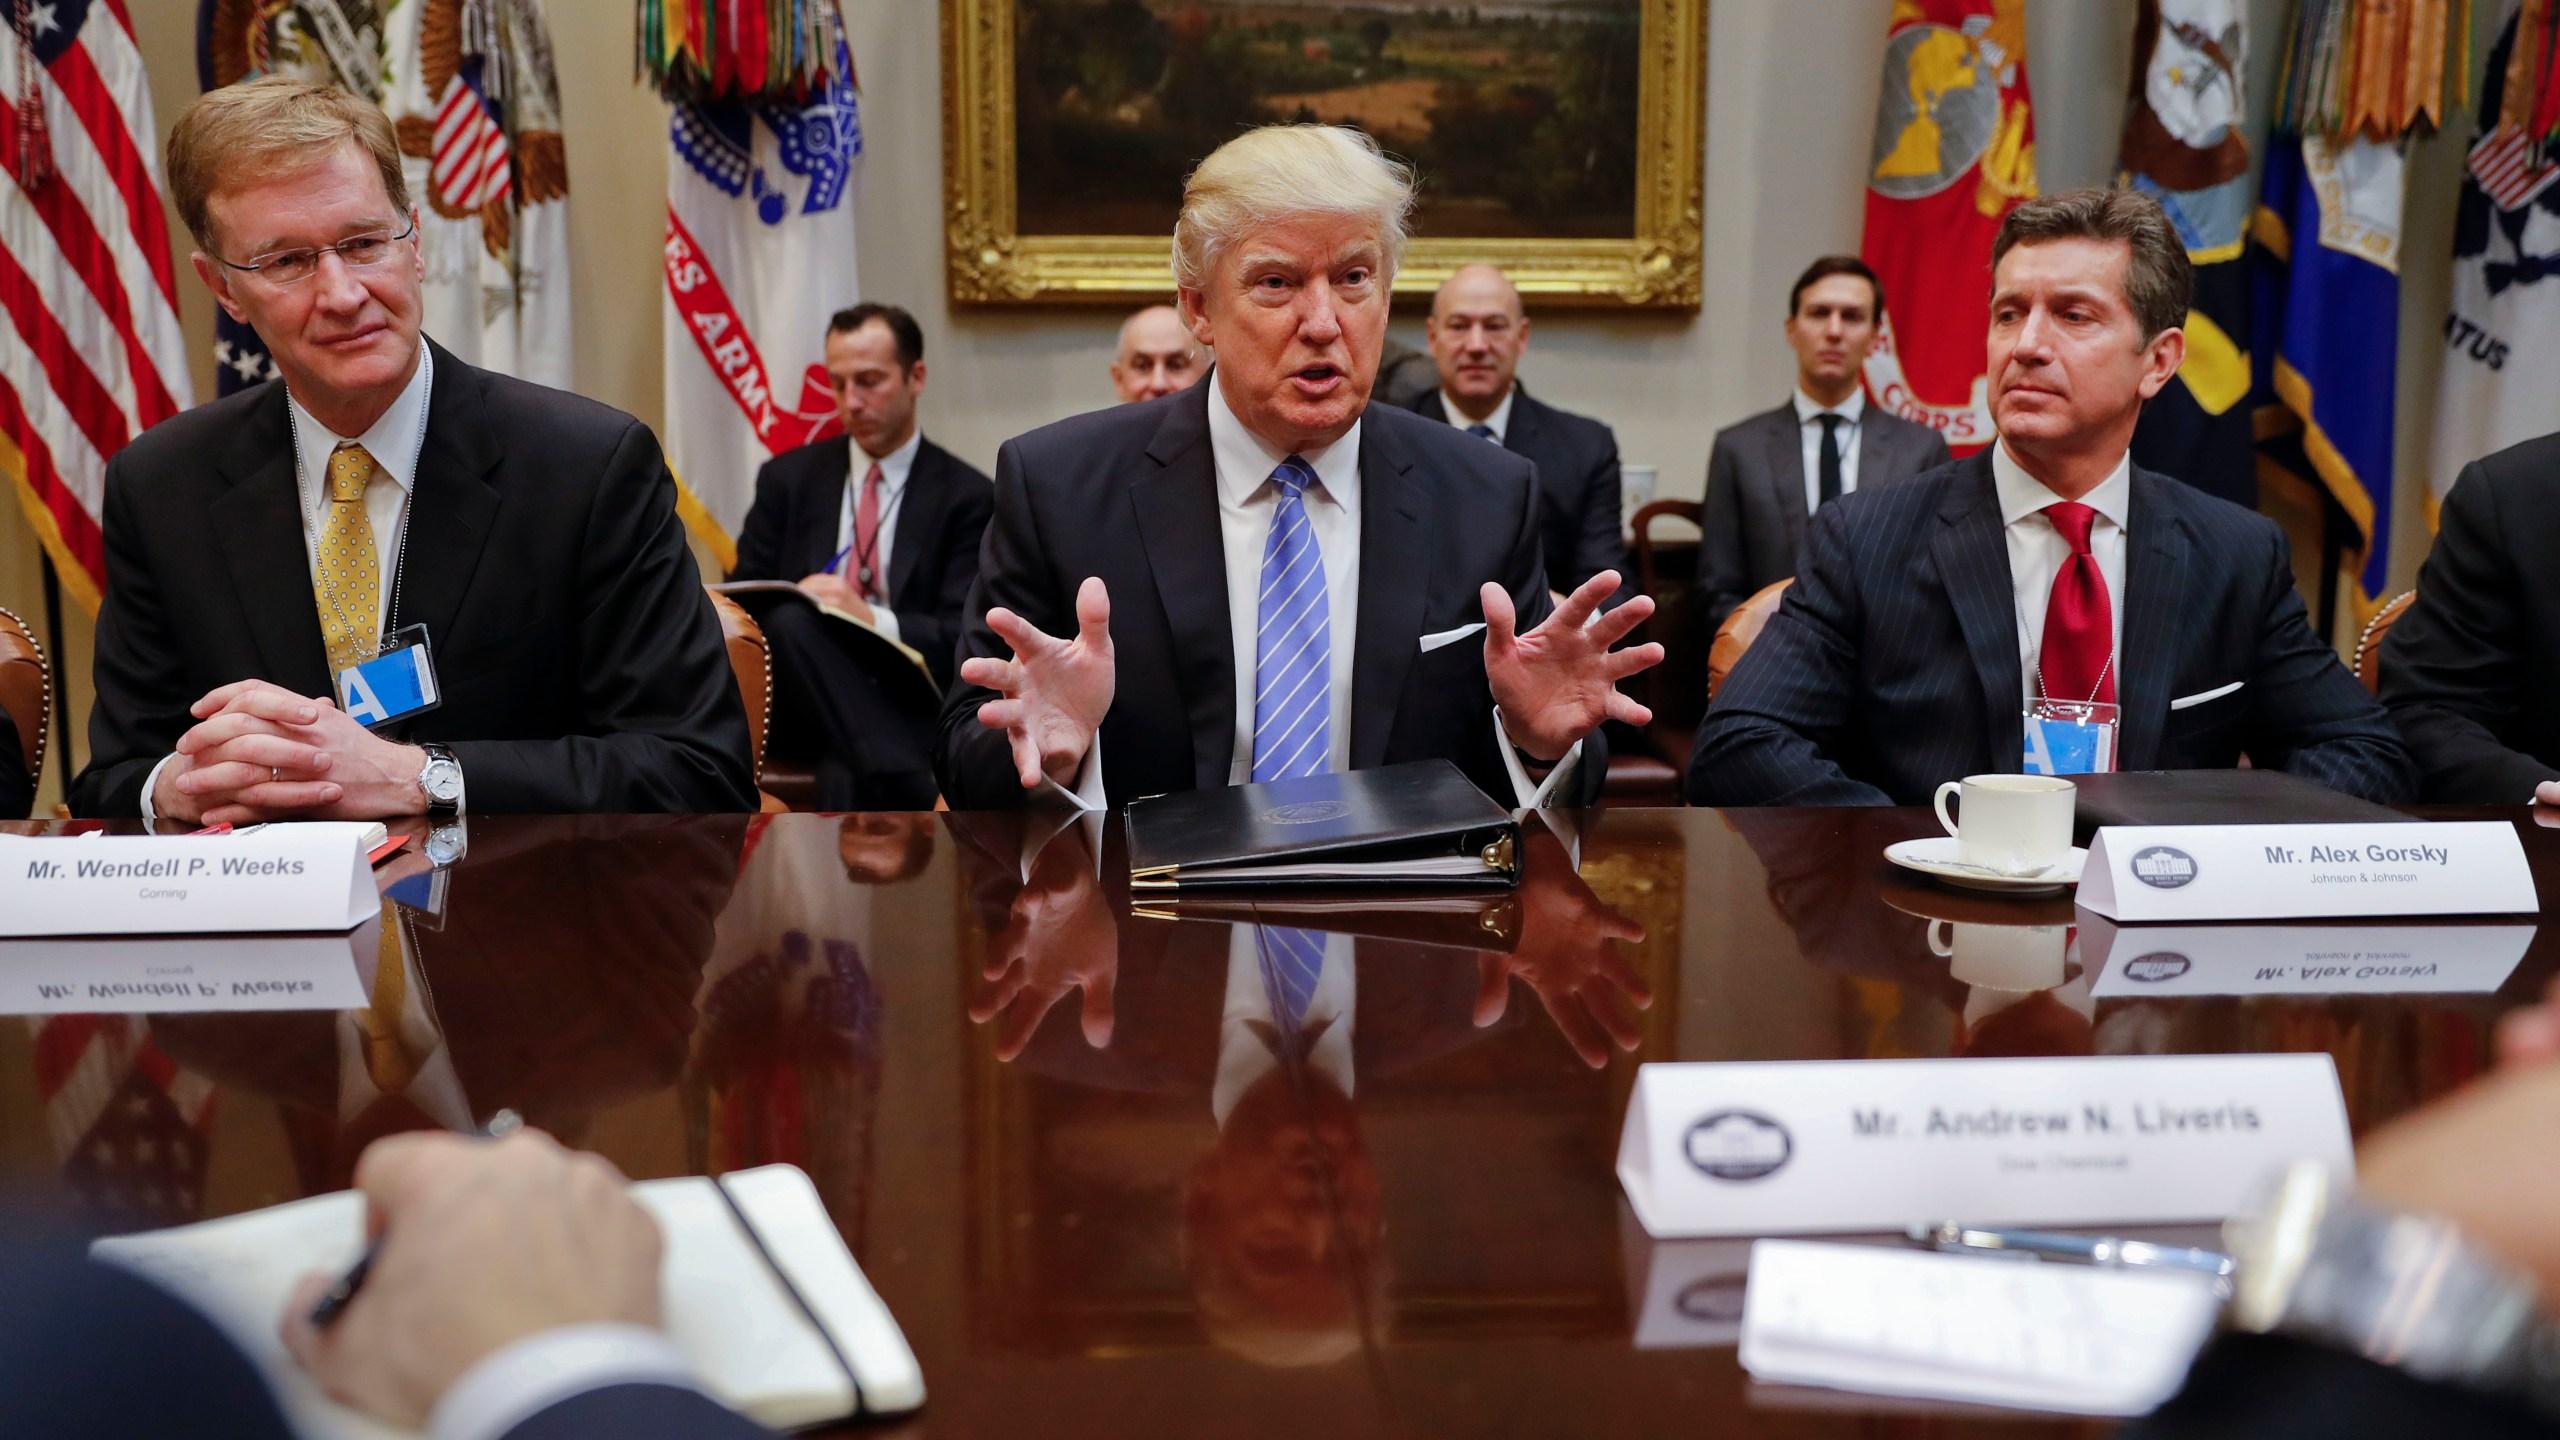 Donald Trump, Alex Gorsky, Wendell P. Weeks_235671